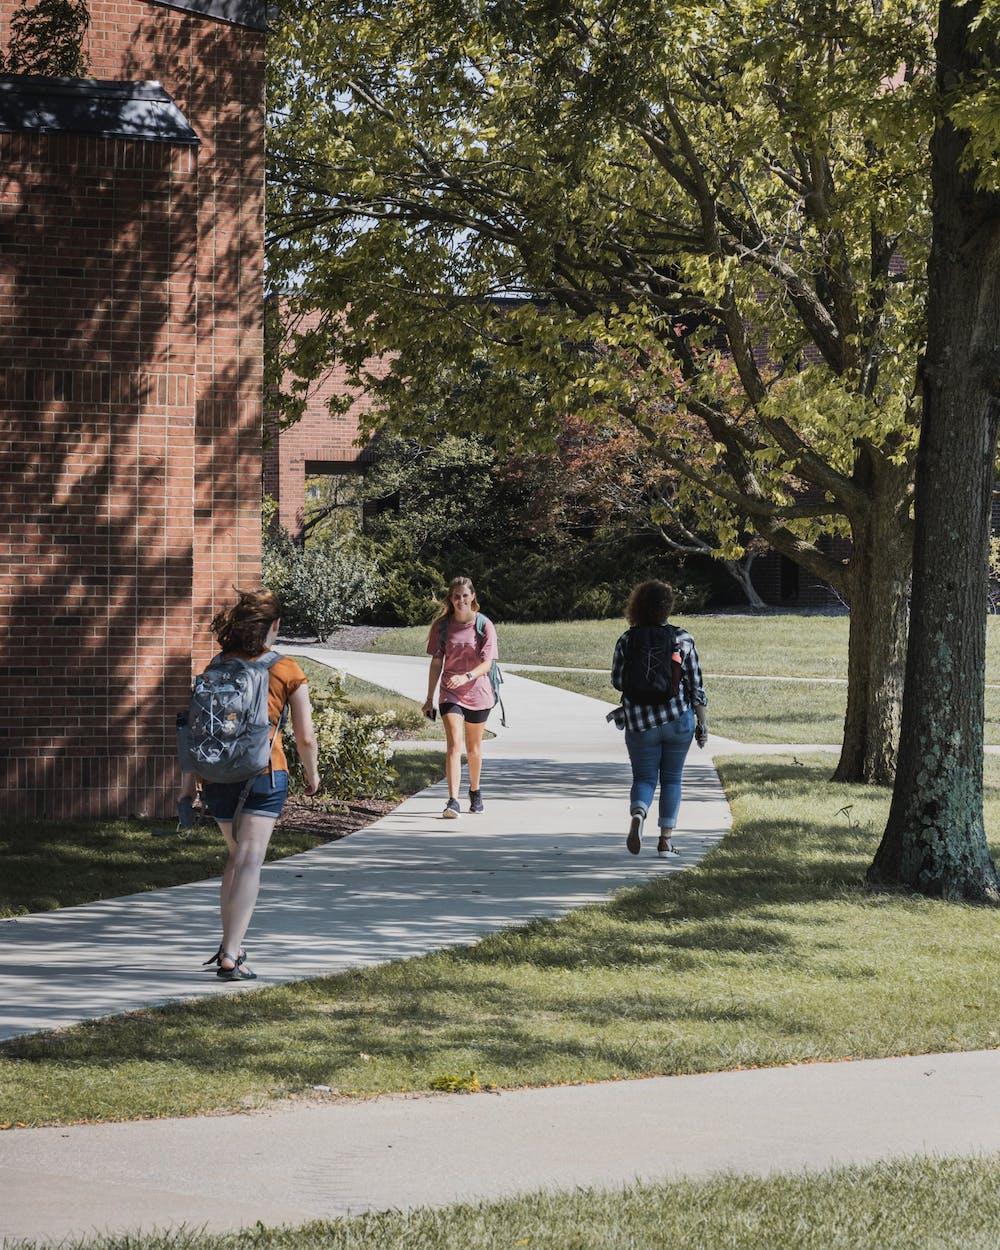 Students enjoy new pathway